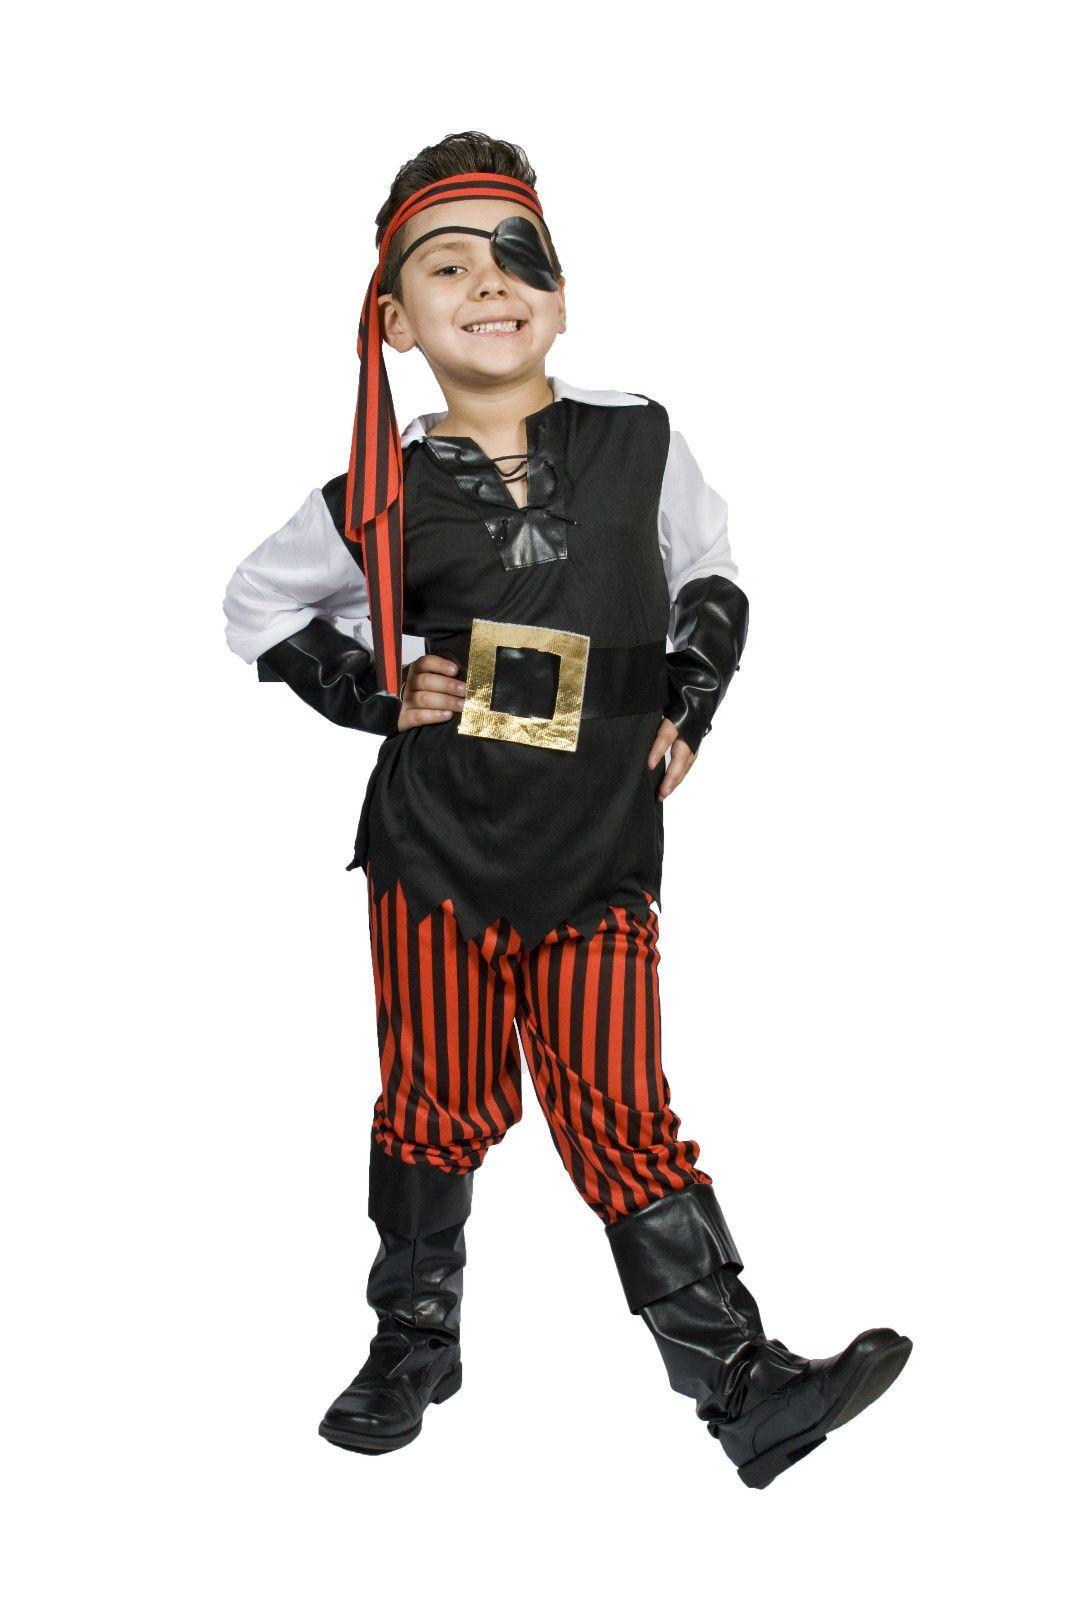 Kids Child Boys Pirate Halloween Costume Size 5678 Ahoy  sc 1 st  Pinterest & Kids Child Boys Pirate Halloween Costume Size 5678 Ahoy Matey ...